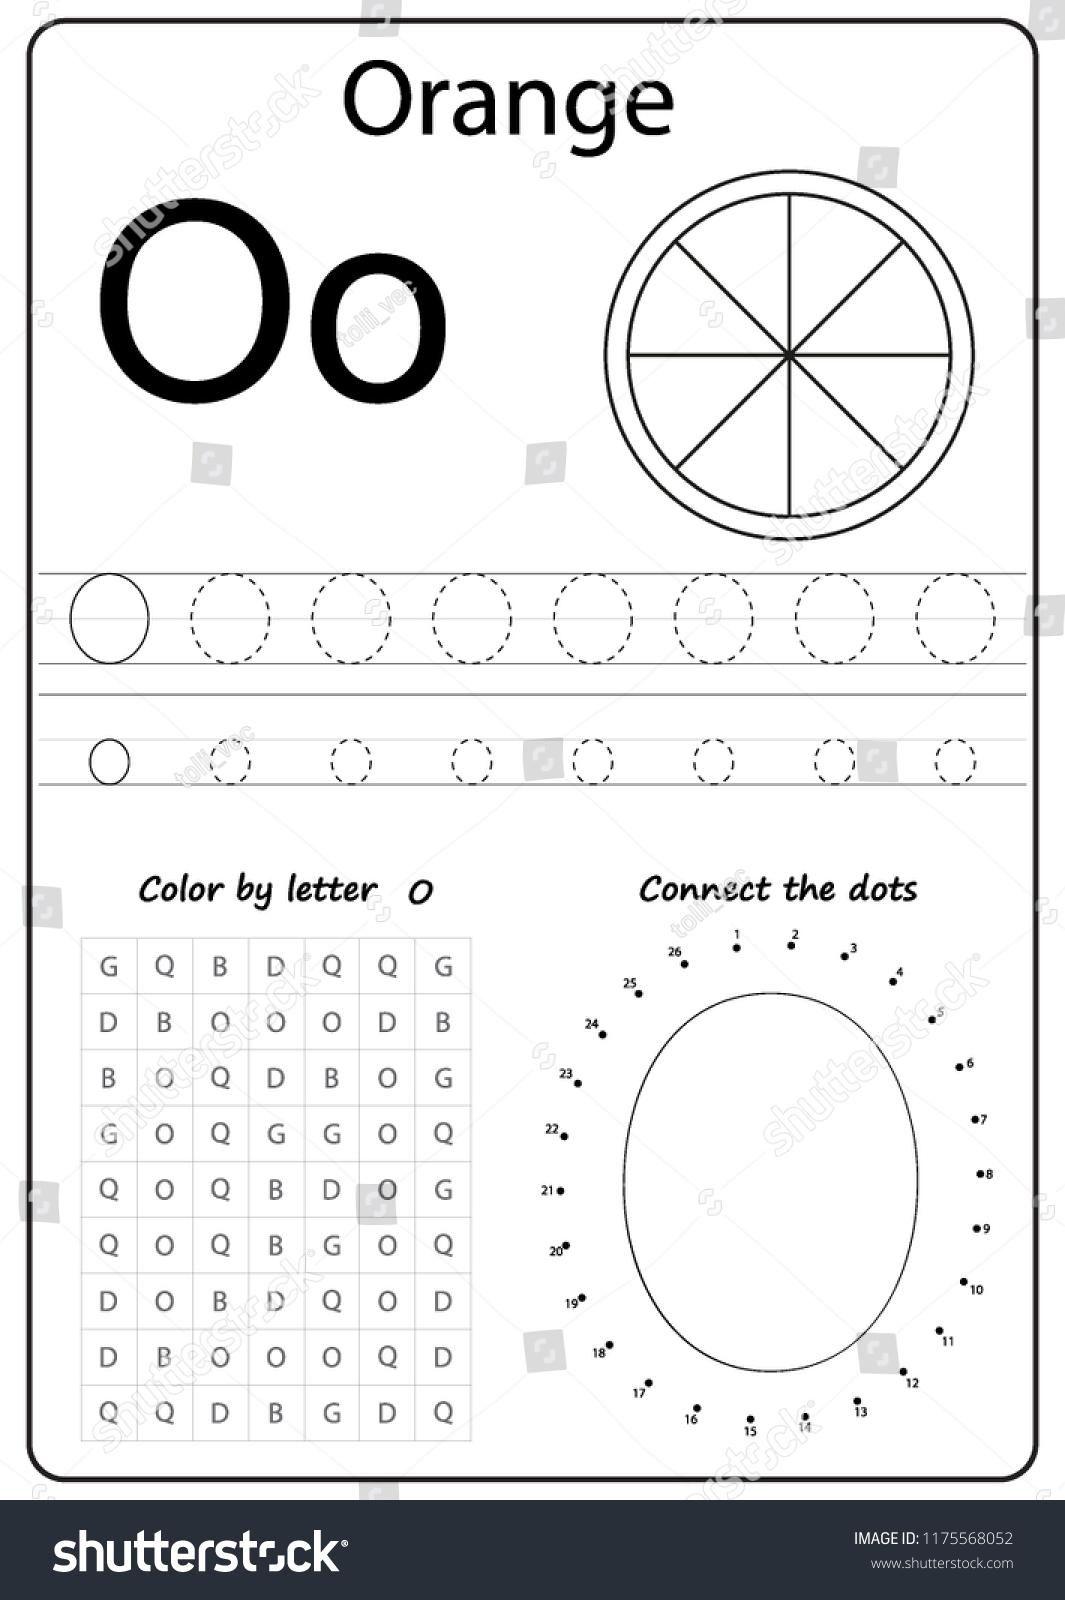 16 Alphabet Exercises For Kids In